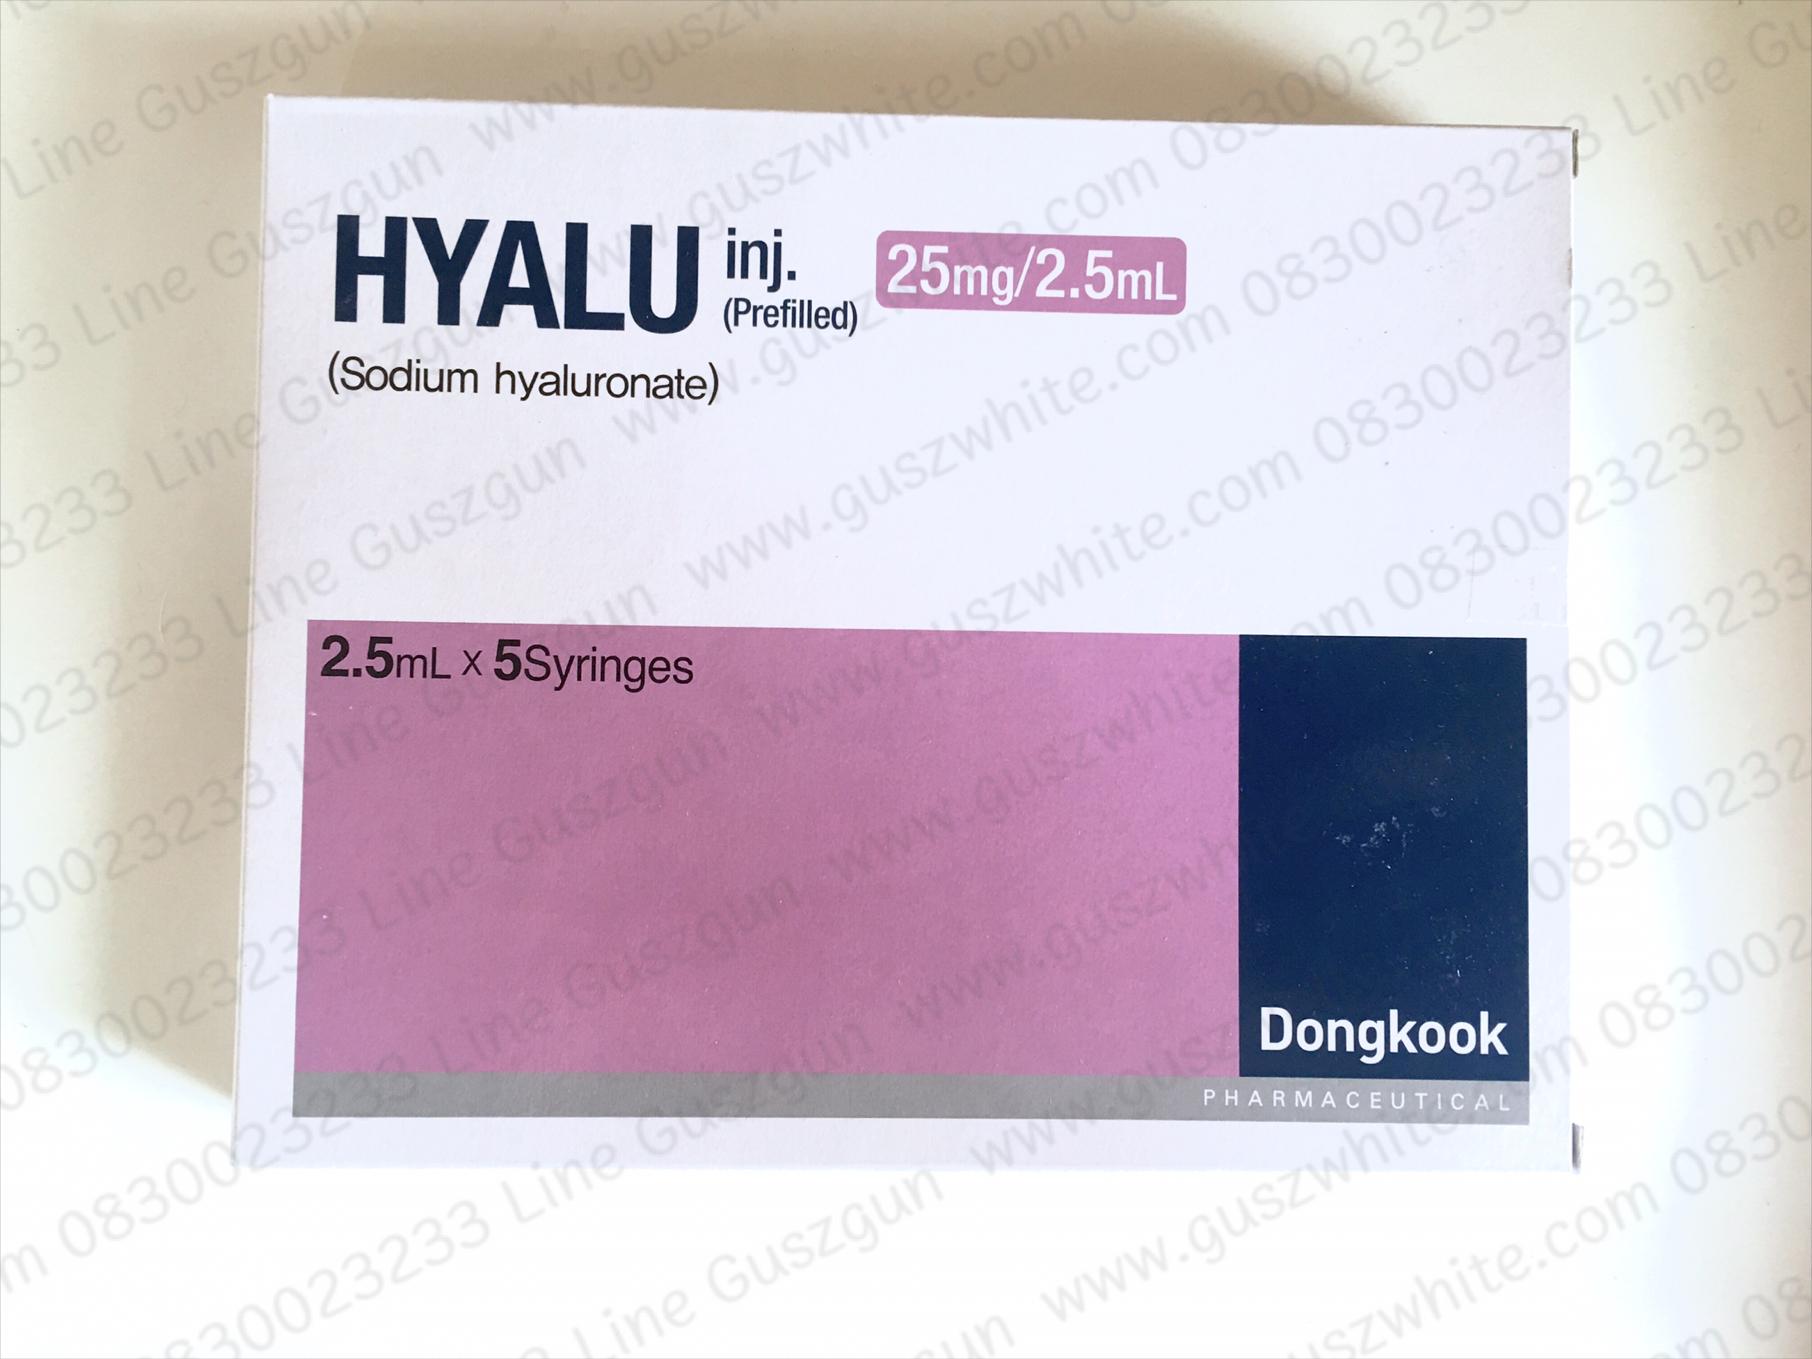 Hyalu inj. Prefilled (Sodium Hyaluronate) 25mg/2.5ml